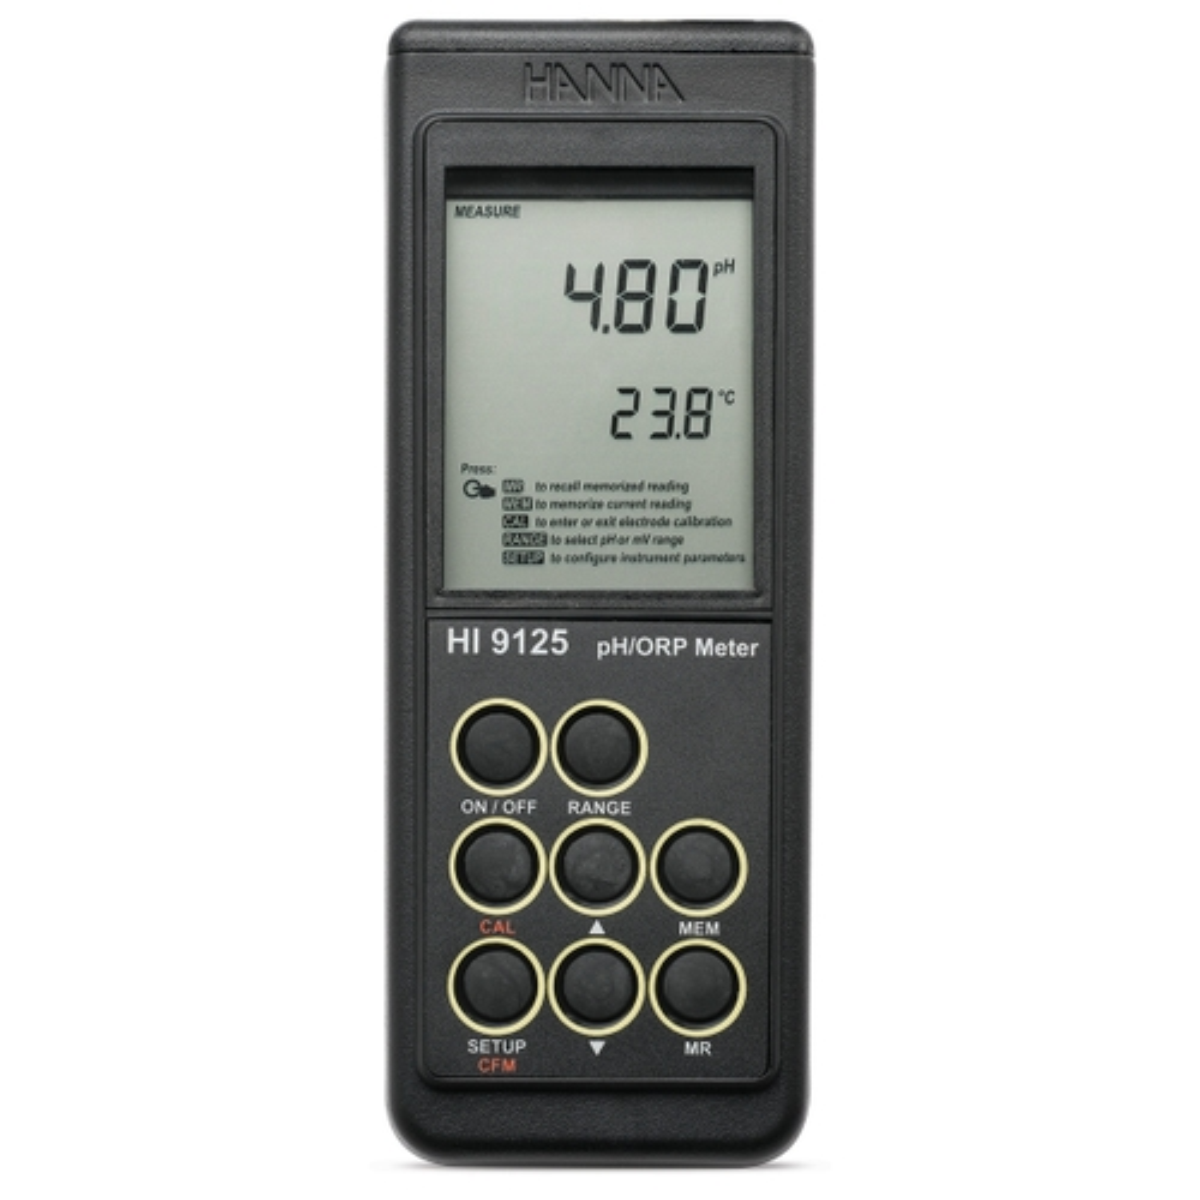 HI9125 Waterproof Portable pH/mV Meter